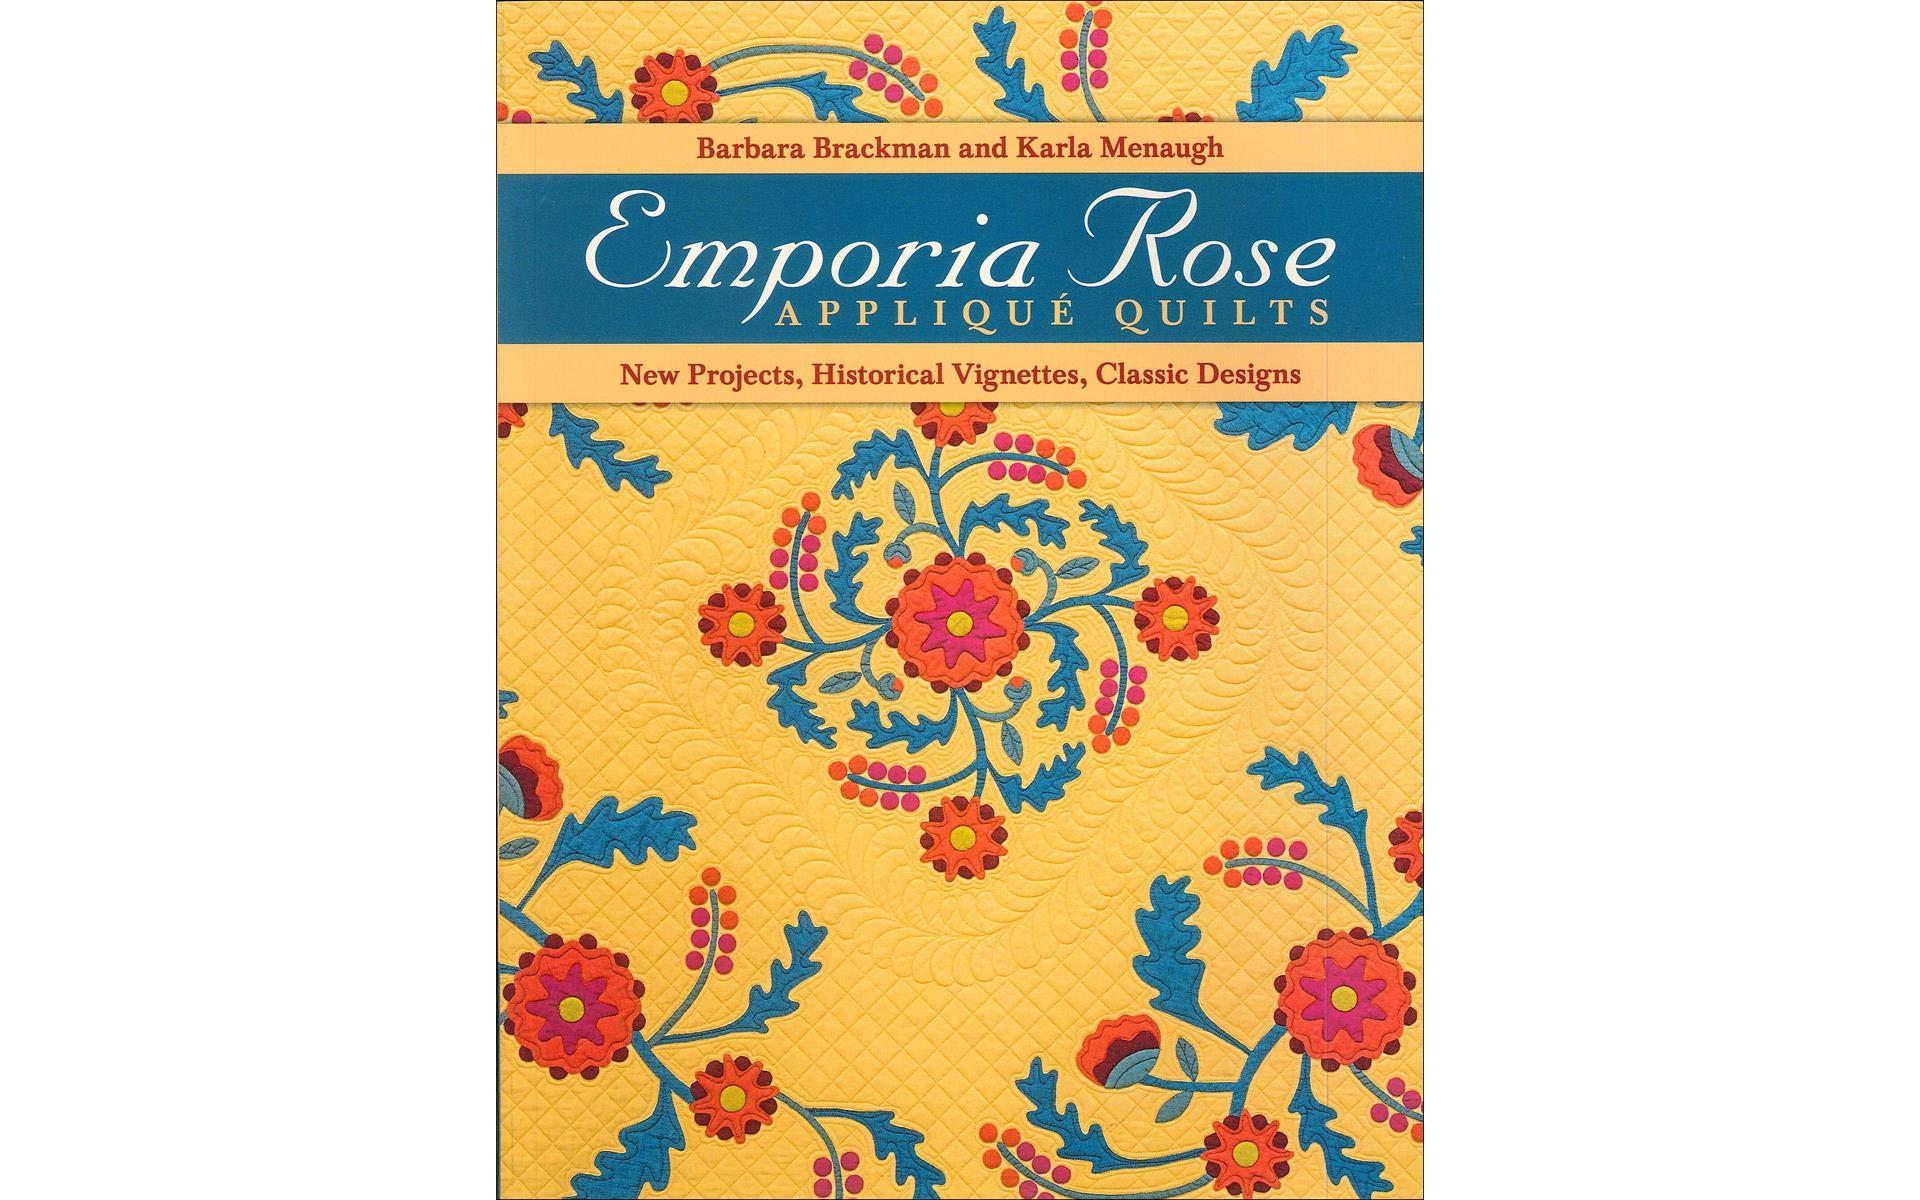 C&T PUBLISHING C&T Emporia Rose Applique Quilts Bk